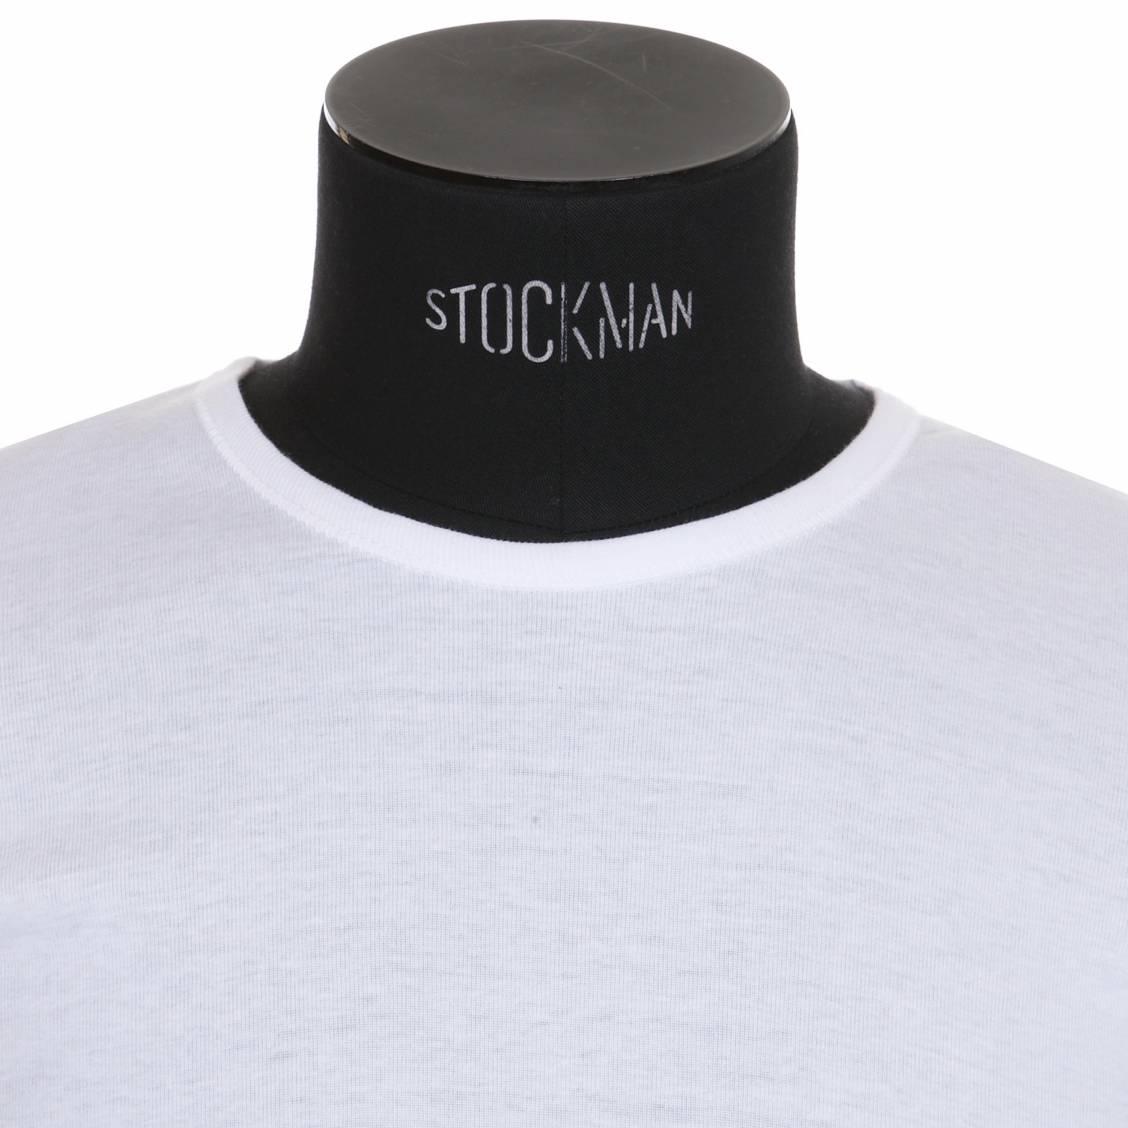 Le tee-shirt blanc Eminence a un col rond